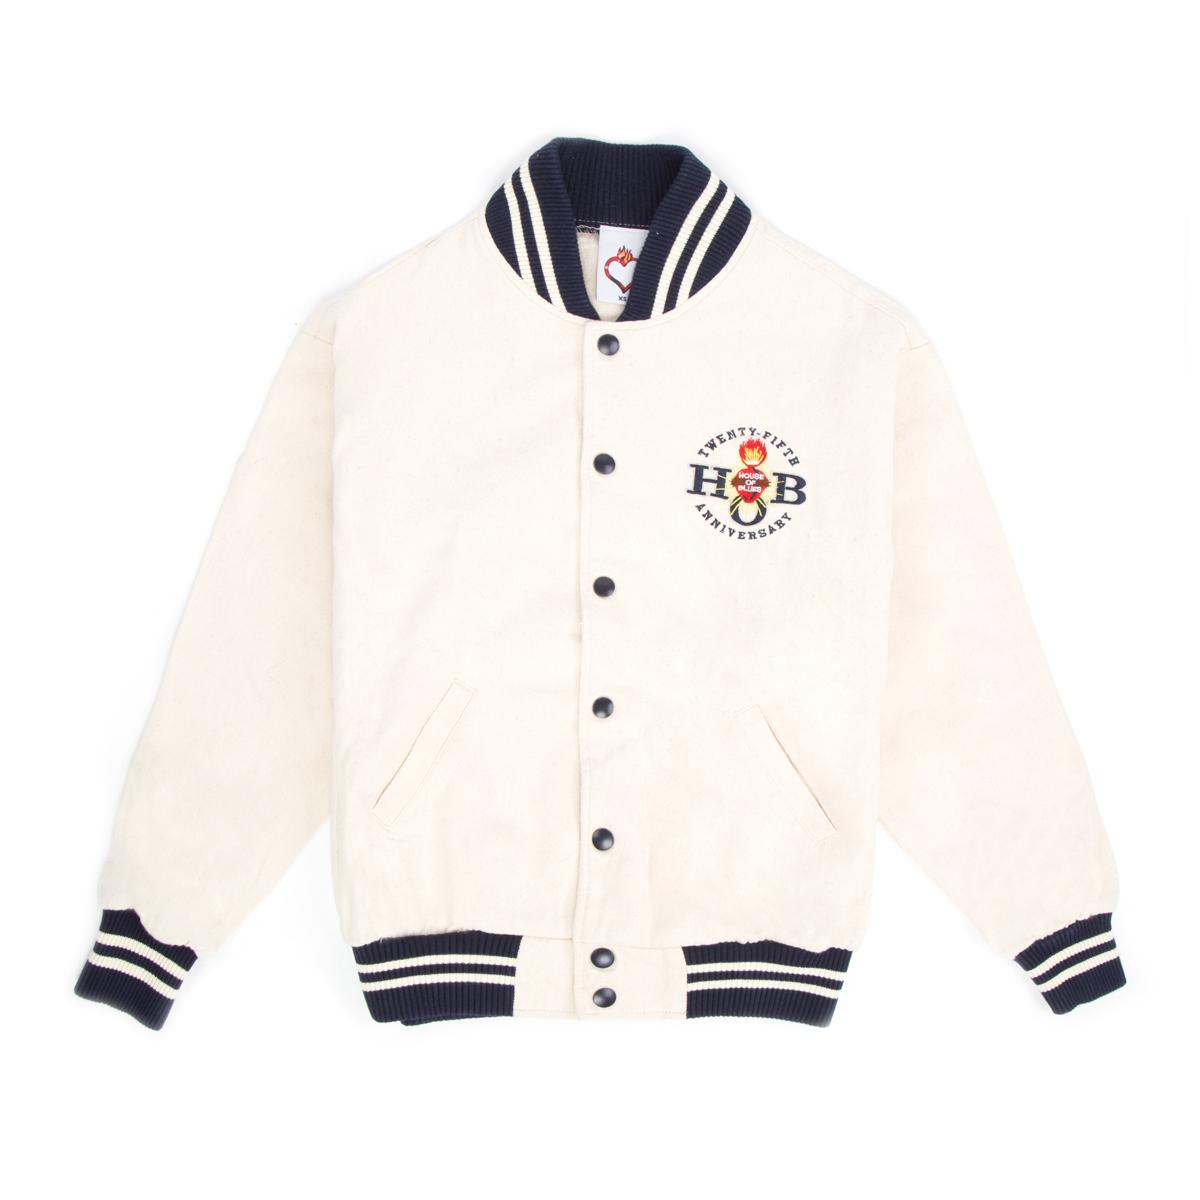 HOB Jacket